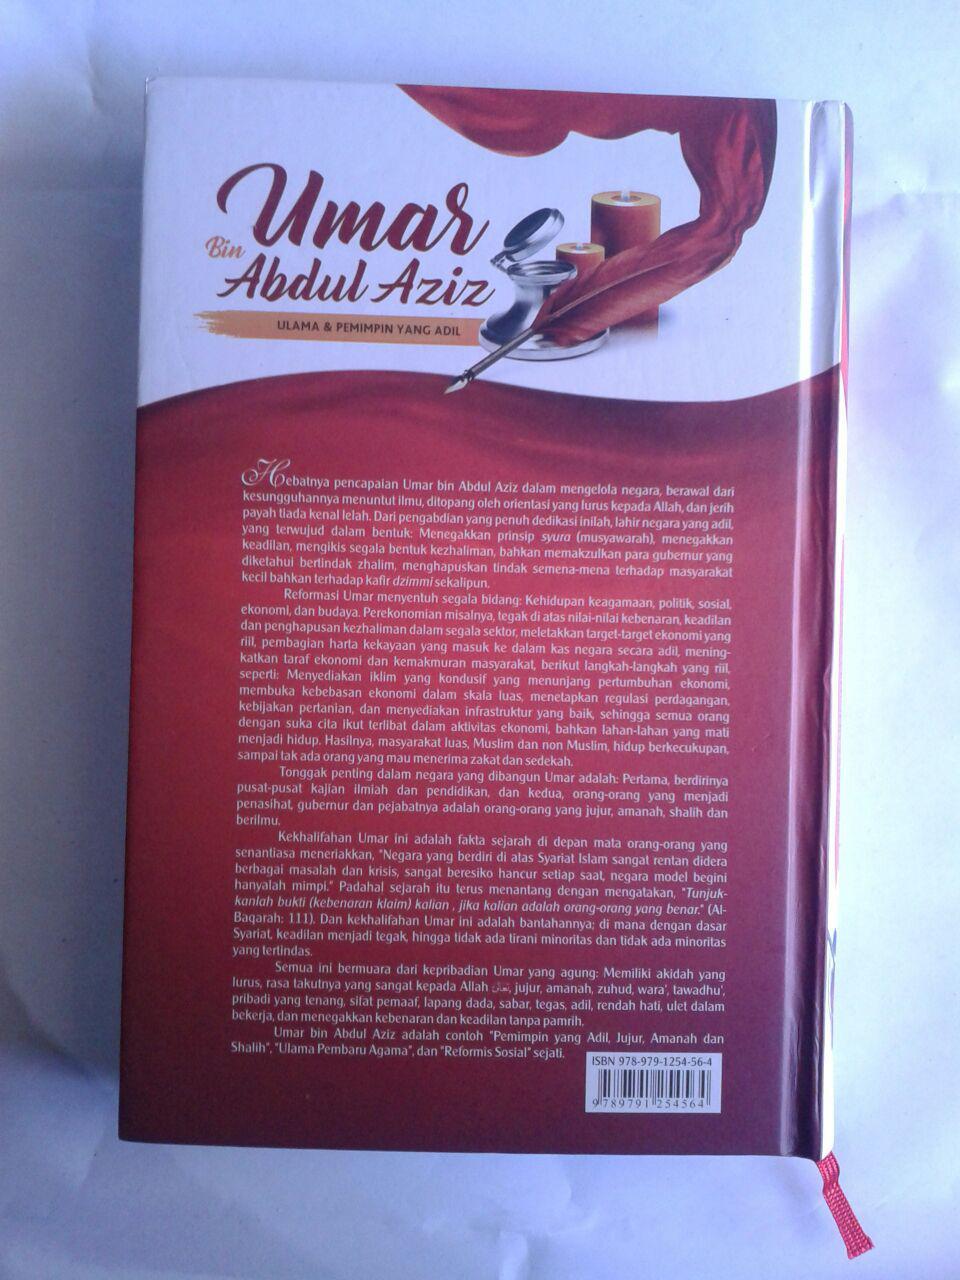 Buku Perjalanan Hidup Khalifah Yang Agung Umar Bin Abdul Aziz Ulama Dan Pemimpin Yang Adil cover